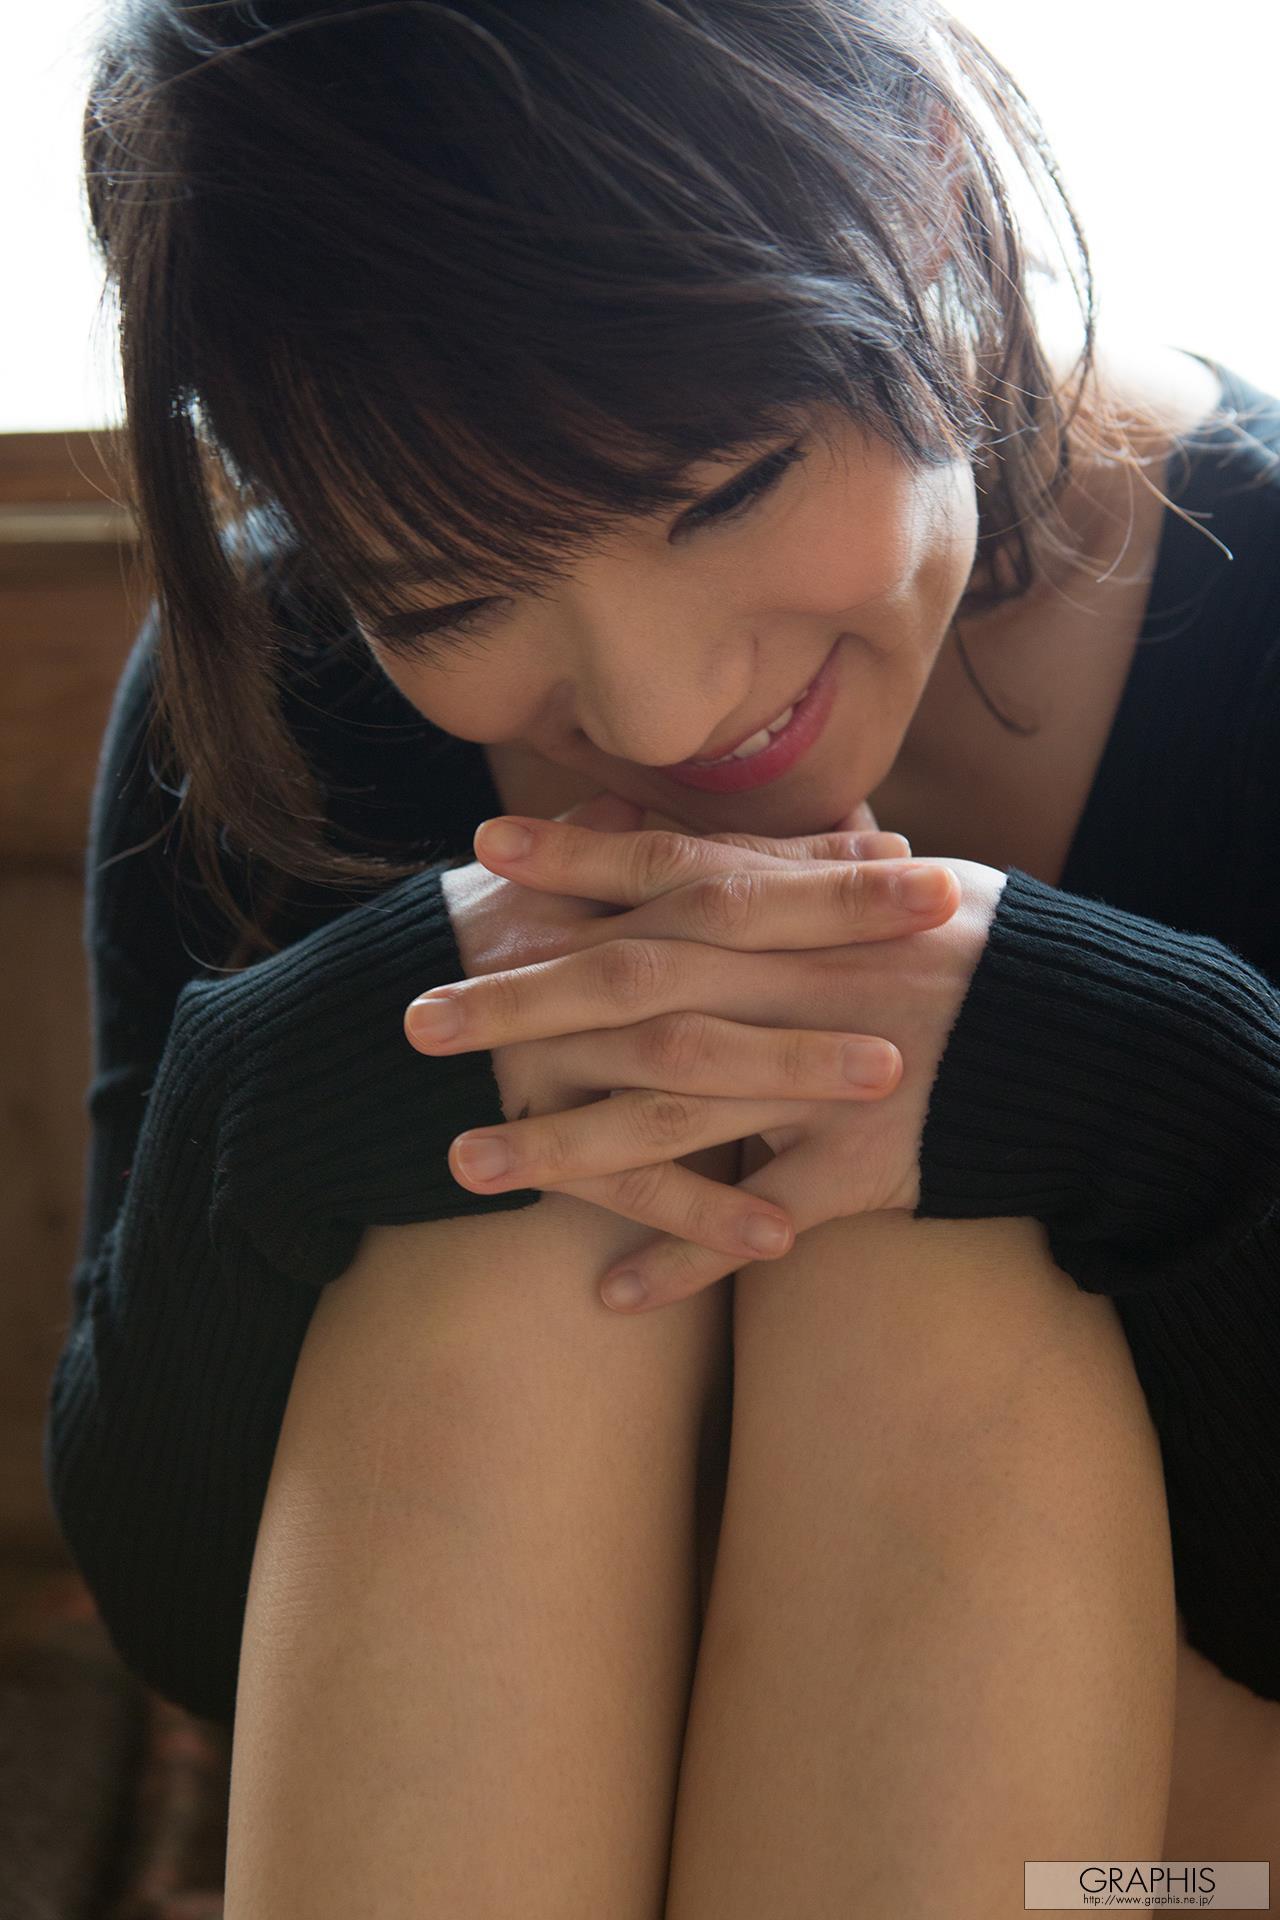 gra_kaho-s092.jpg